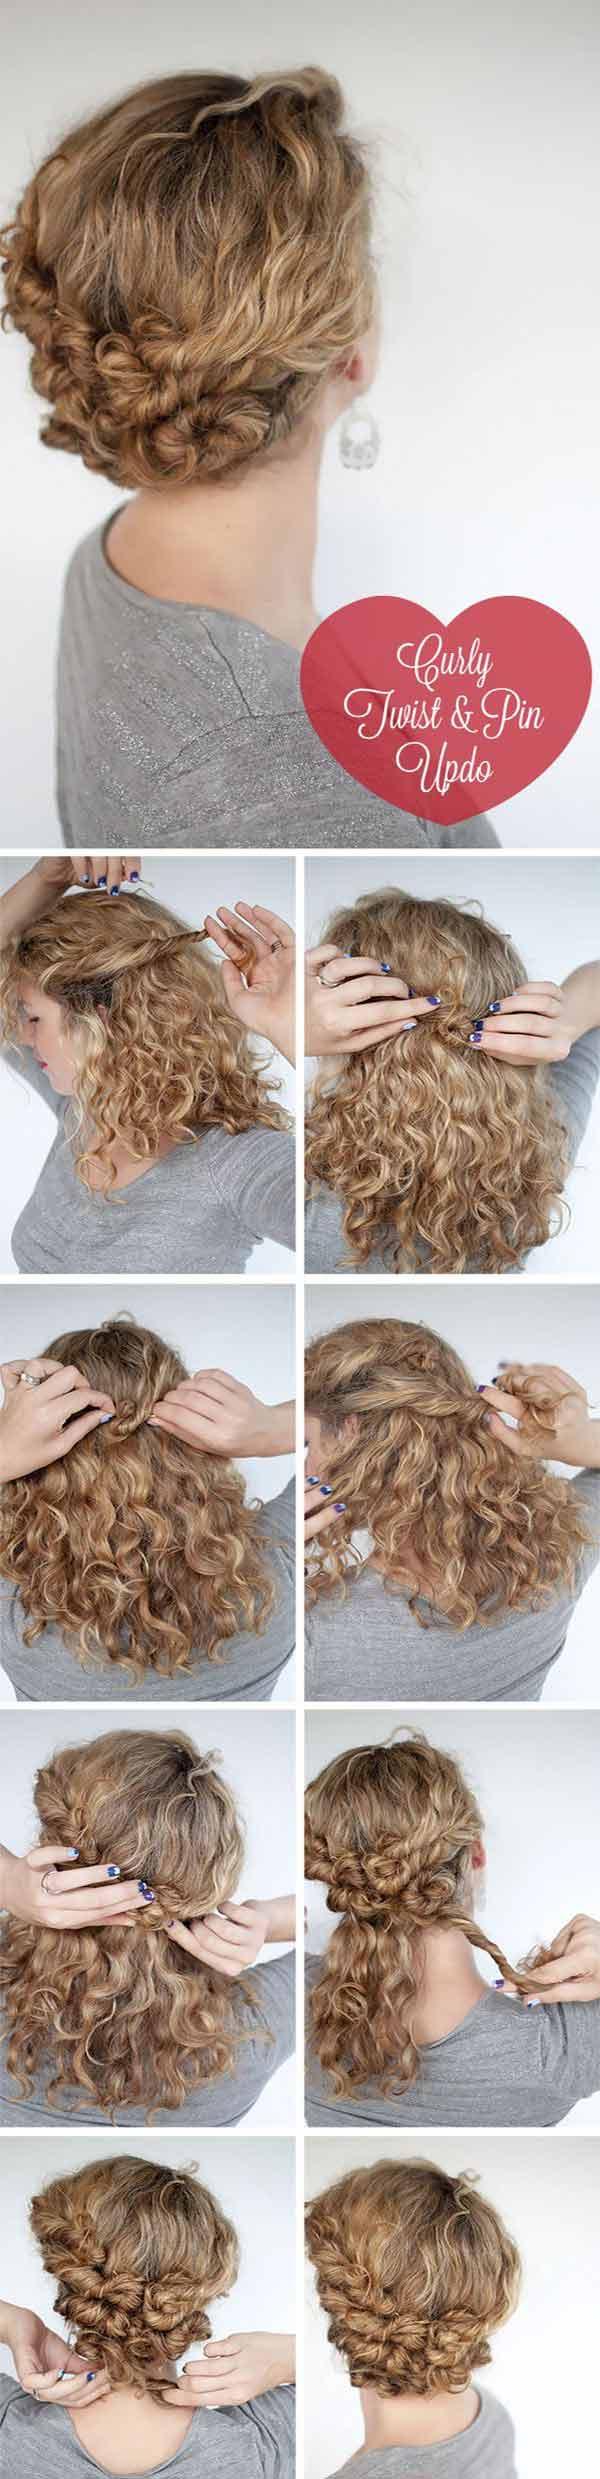 Twist and Pin Short Hair